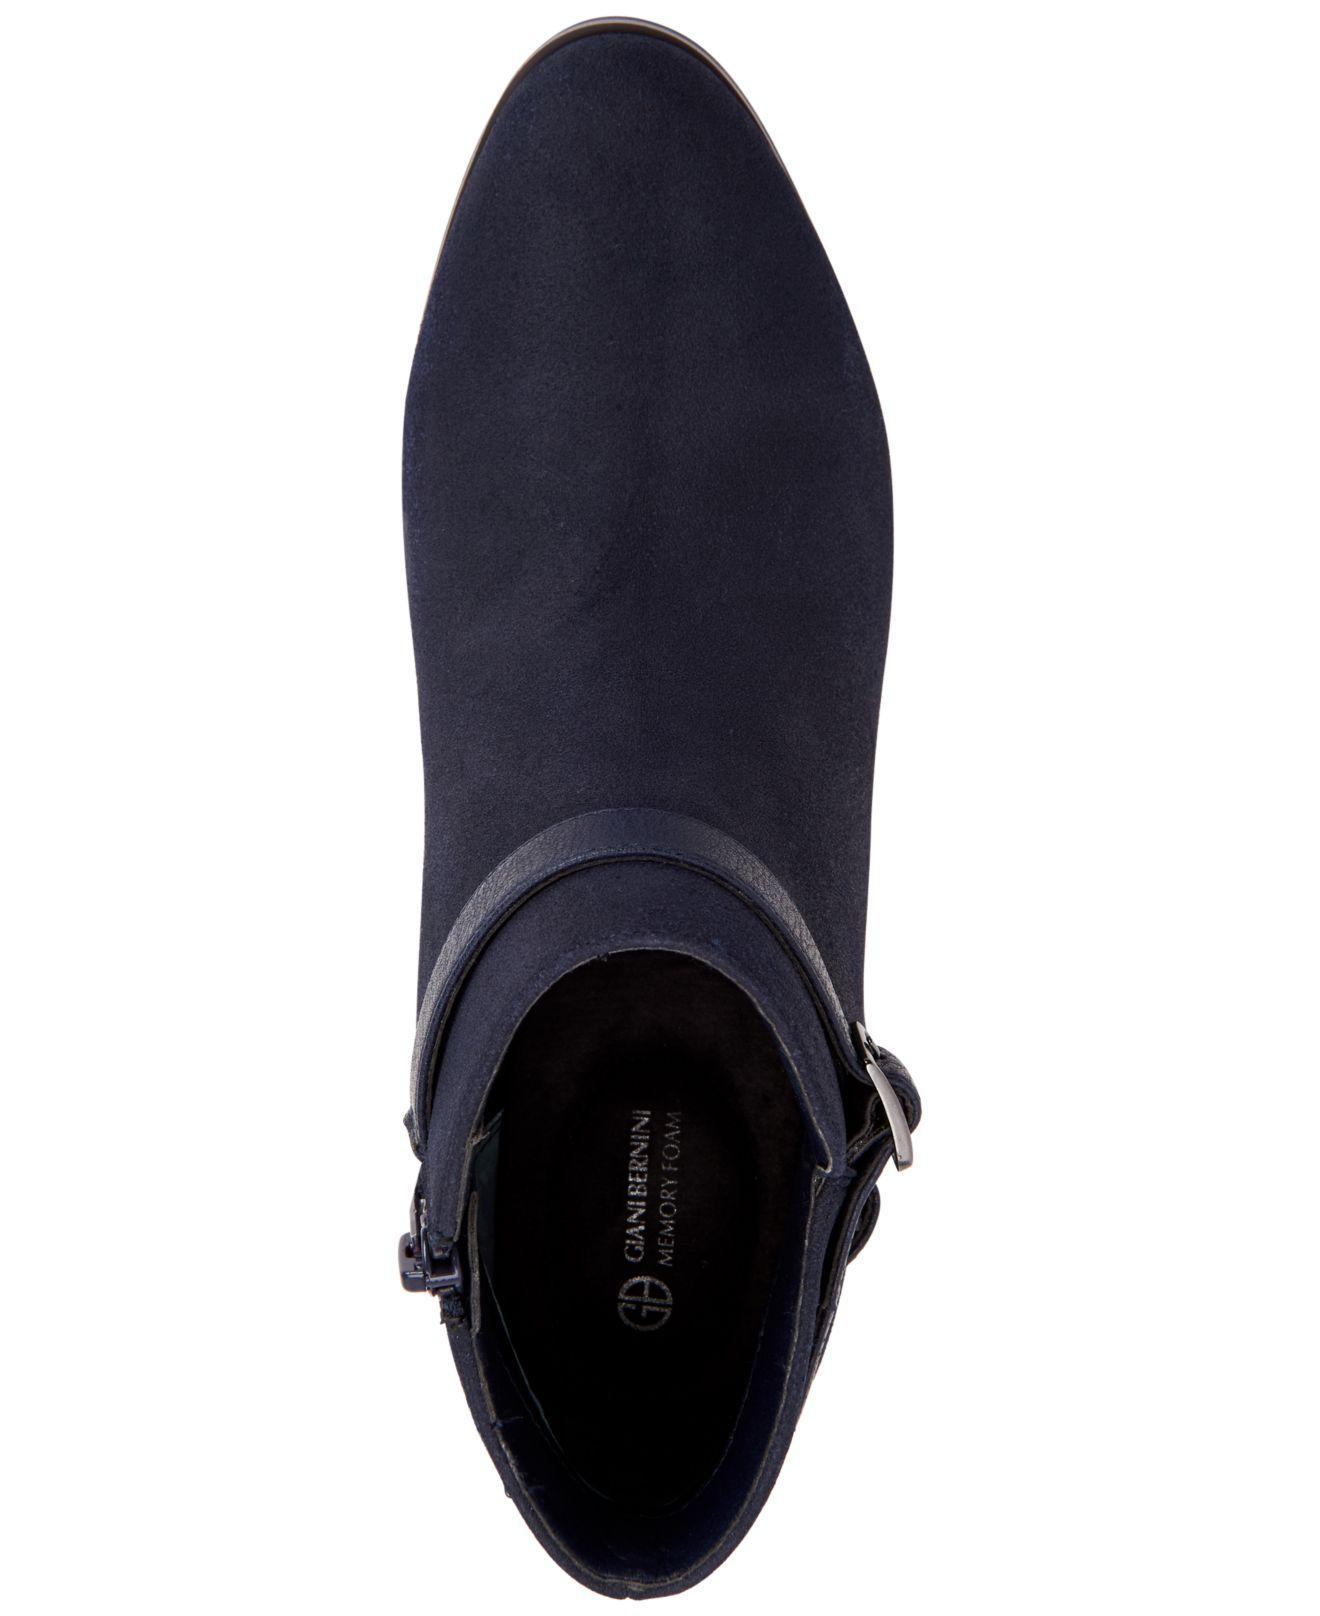 thumbnail 13 - Giani-Bernini-Womens-Dorii-Leather-Almond-Toe-Ankle-Fashion-Boots